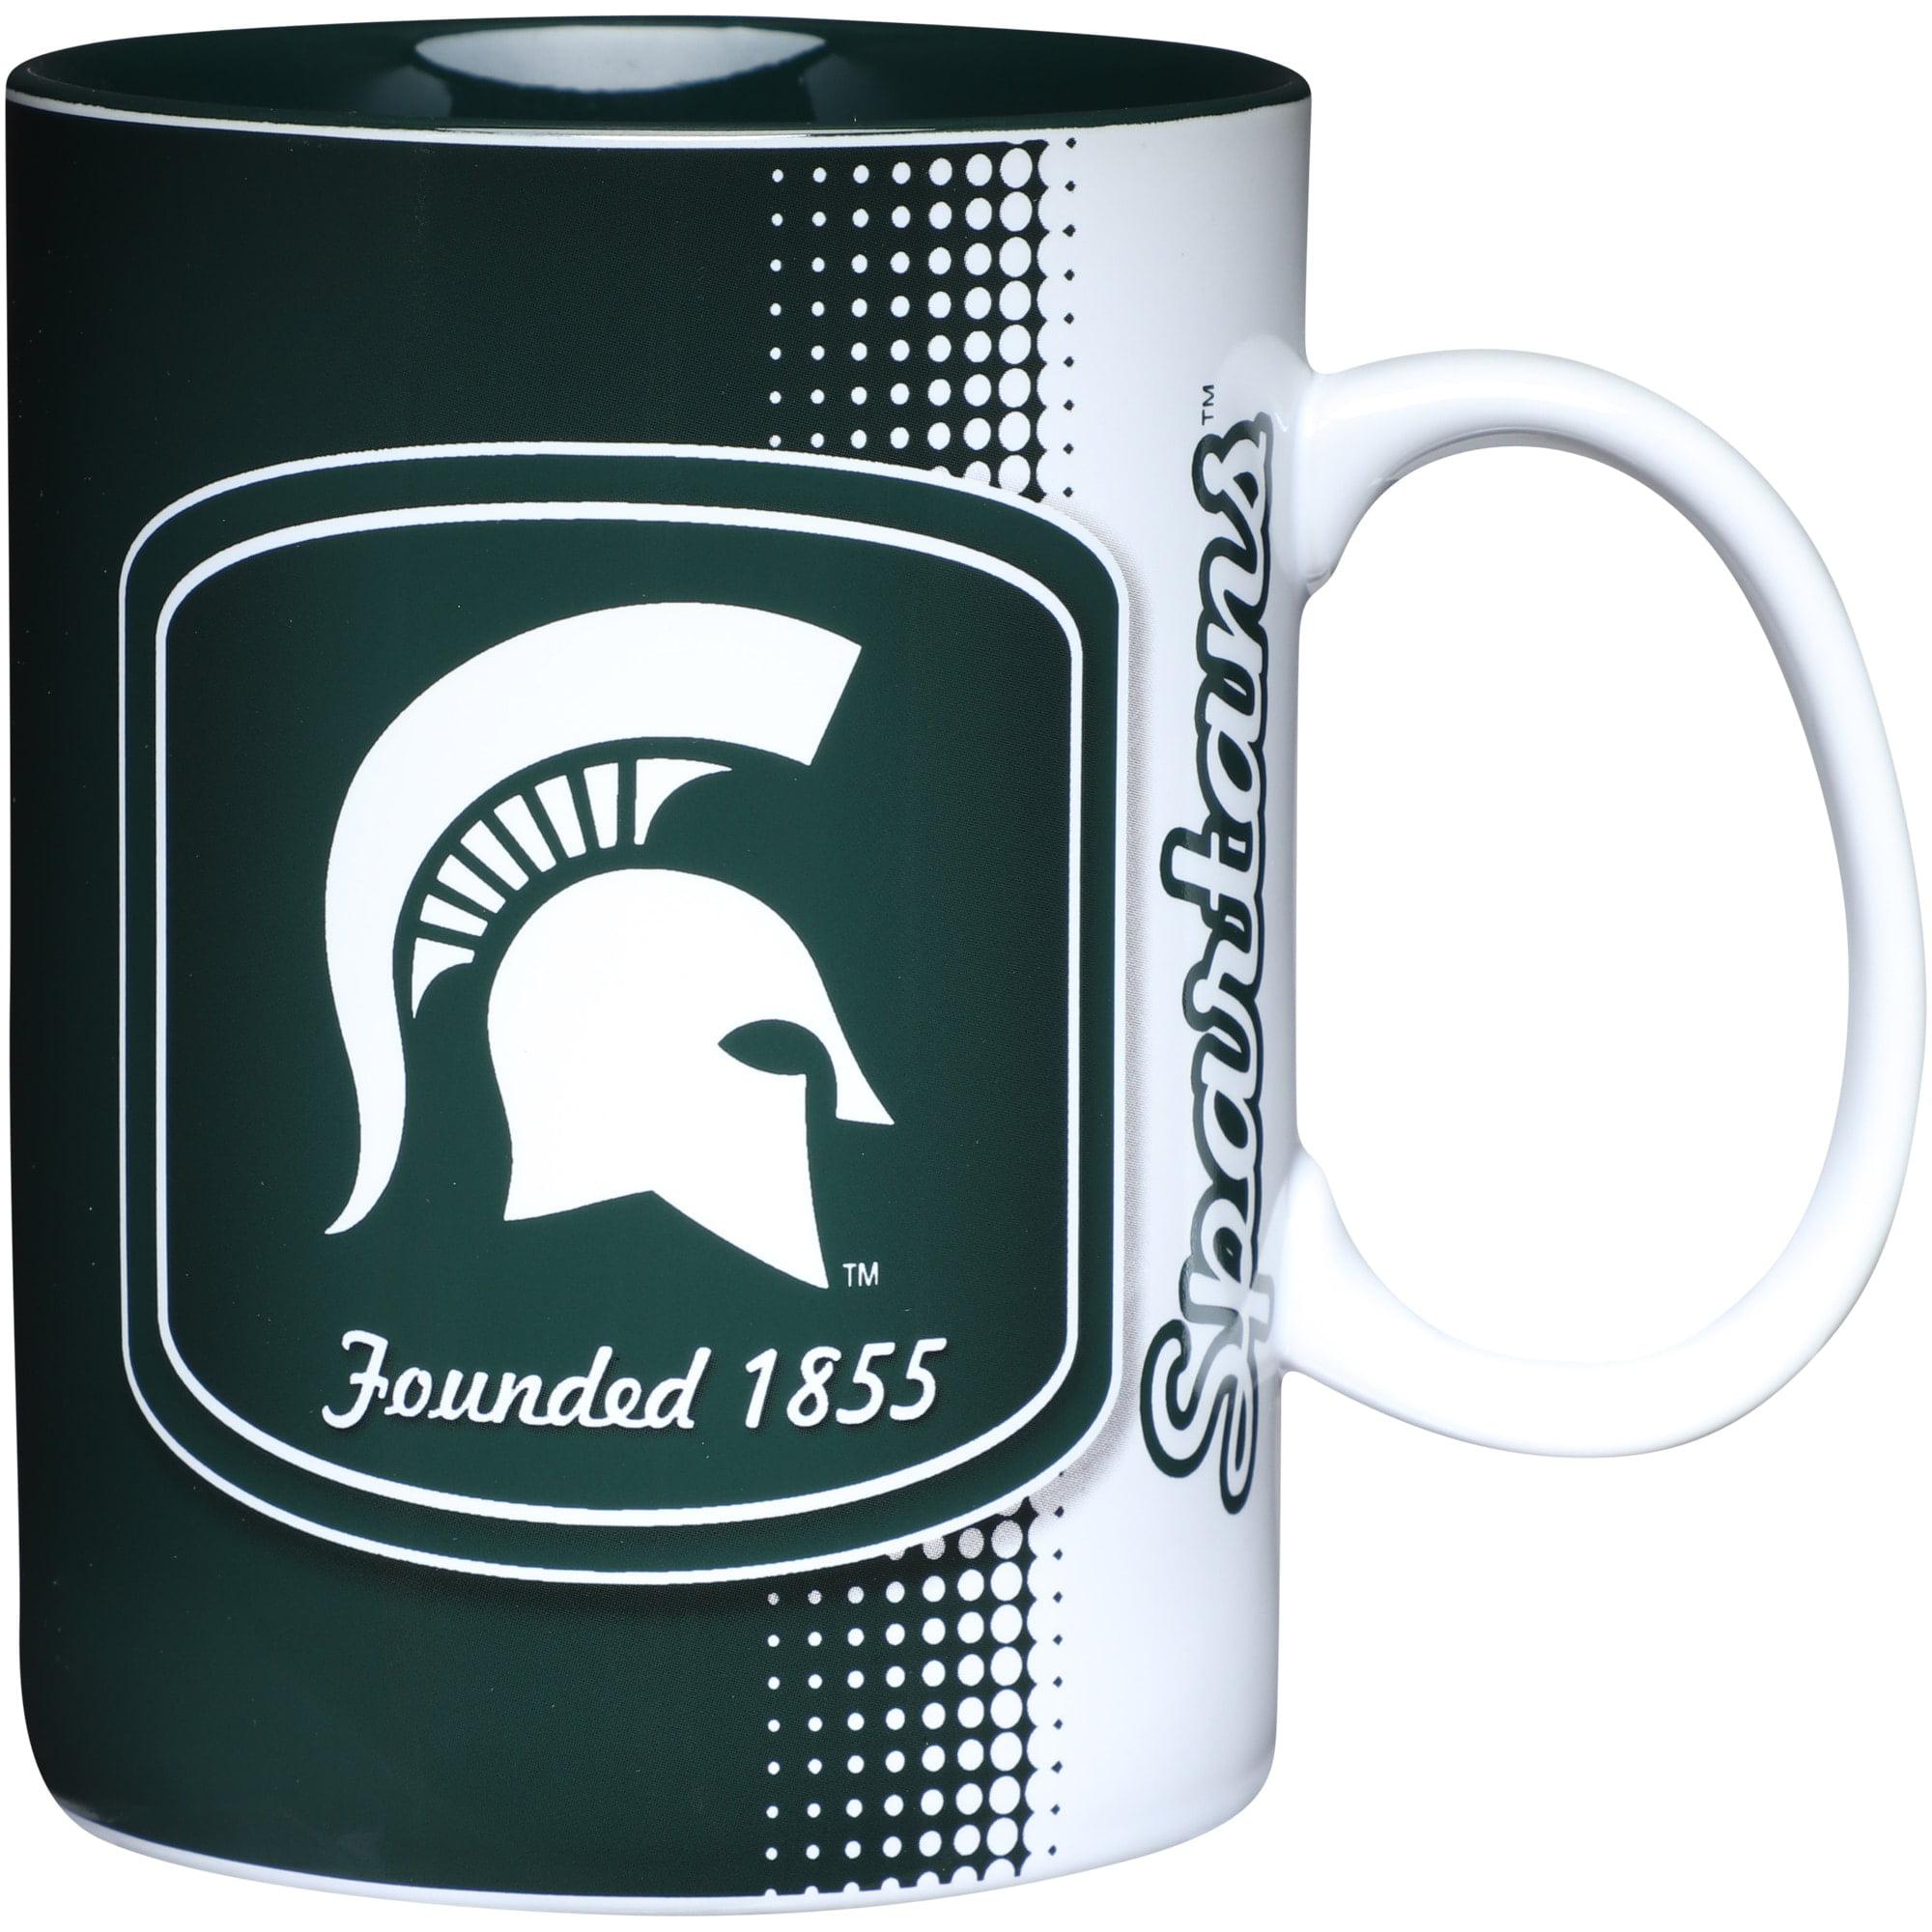 NCAA Tennessee Volunteers 15 oz Ceramic Coffee Mug with Metallic Graphics 19